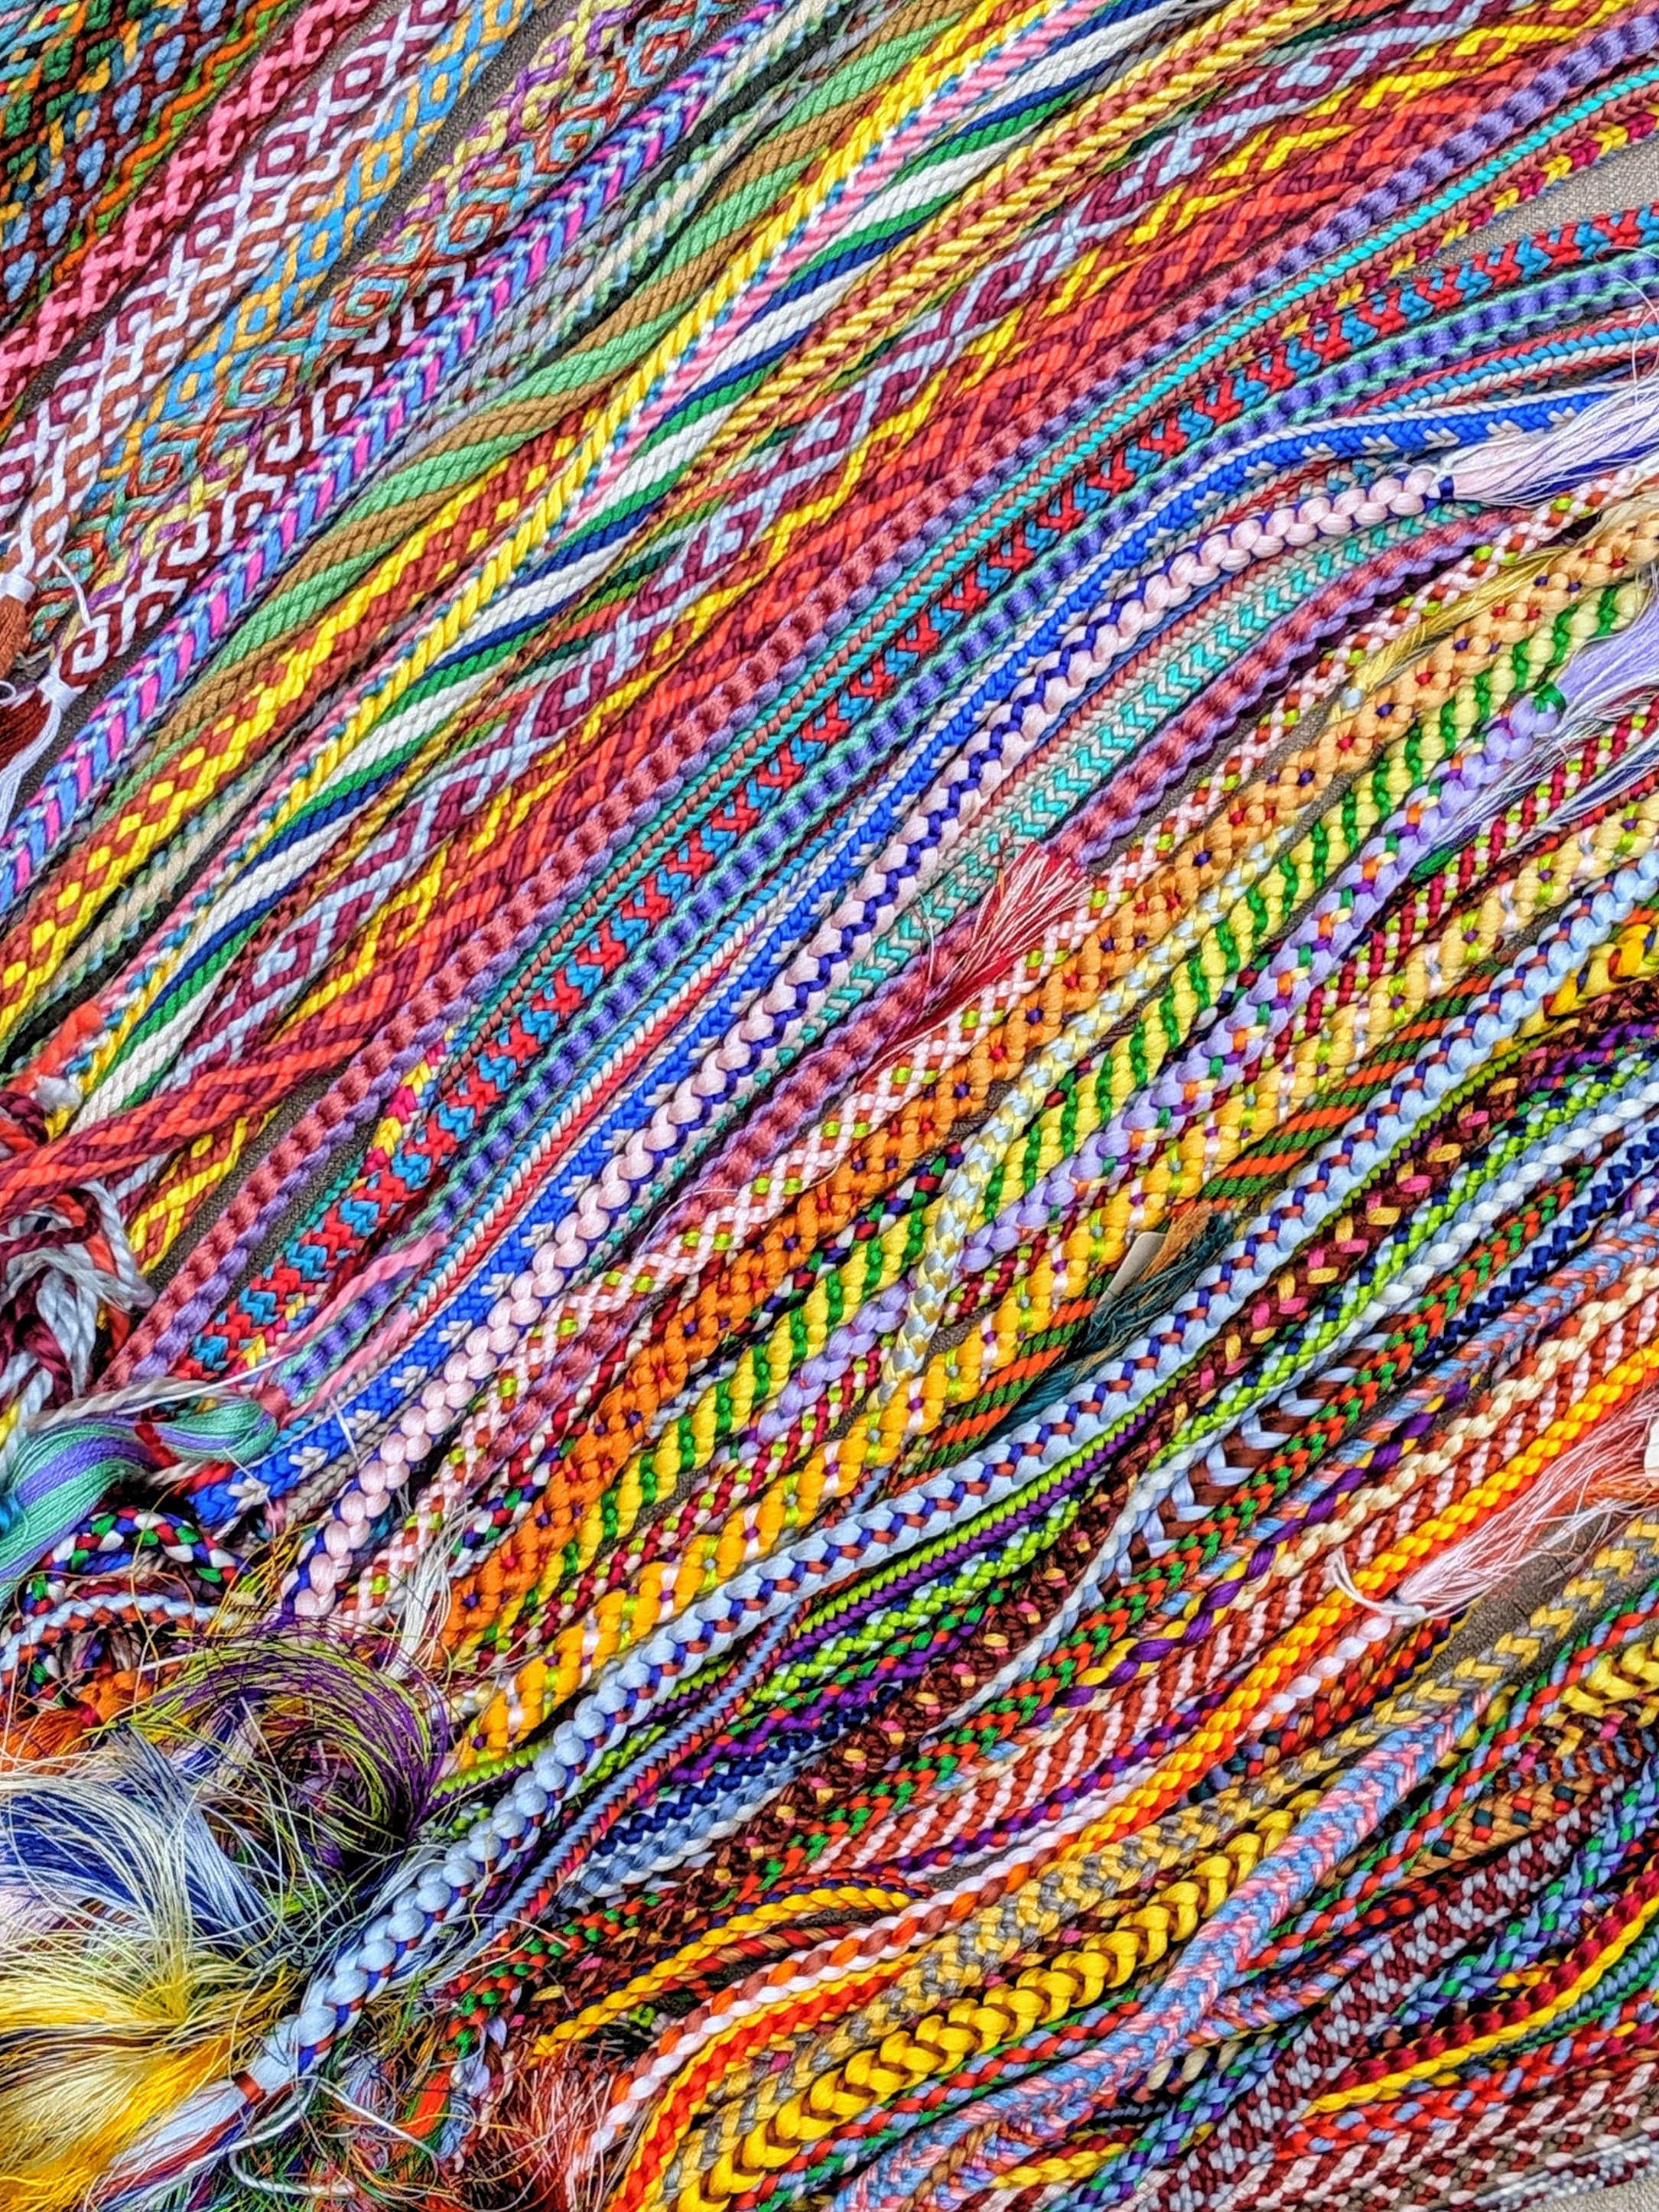 Marudai braids from Braids 250 Patterns from Japan, Peru, and Beyond